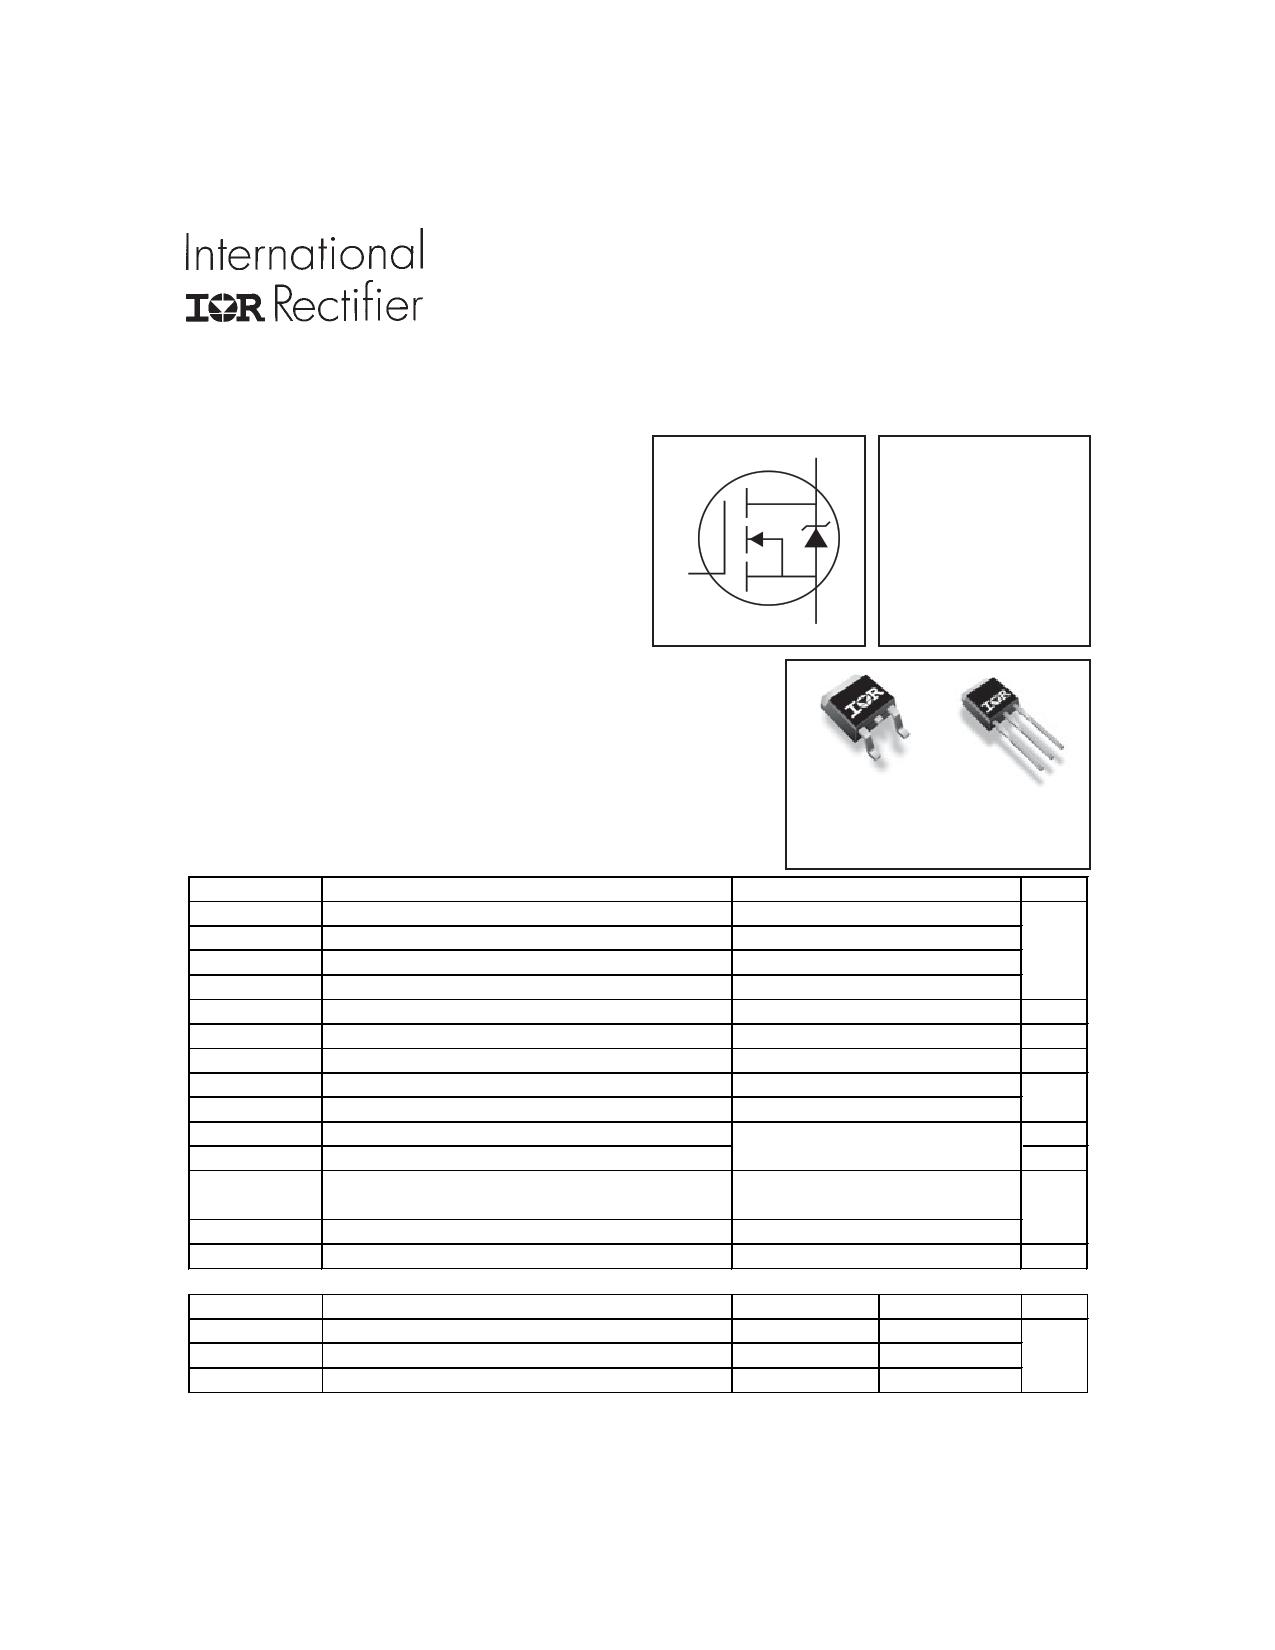 IRFR2307Z Datasheet, IRFR2307Z PDF,ピン配置, 機能